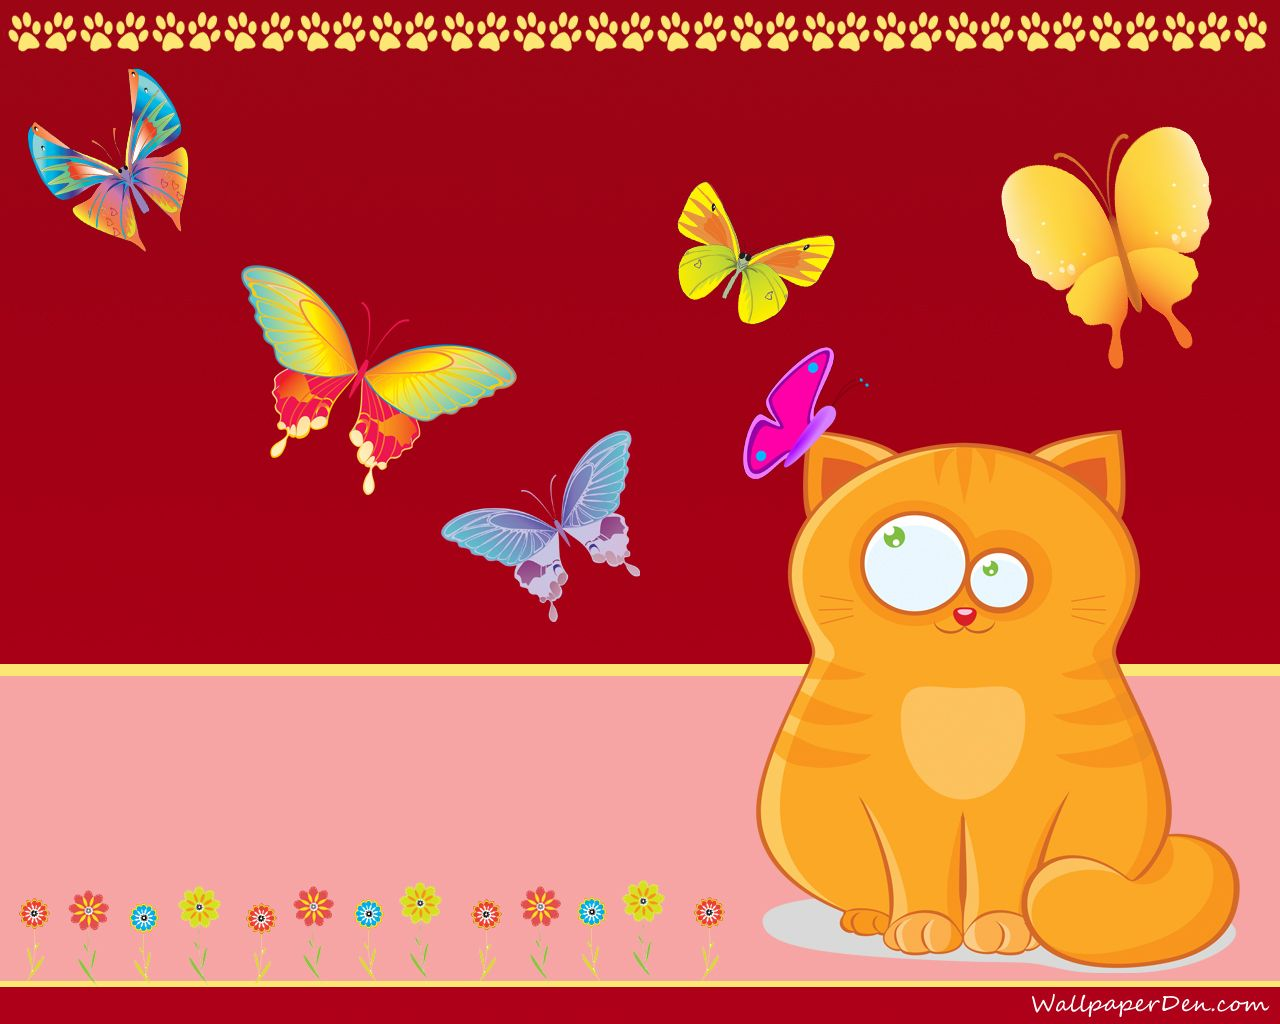 Cute Cartoon Cats Wallpapers 1280x1024px Cute cartoon